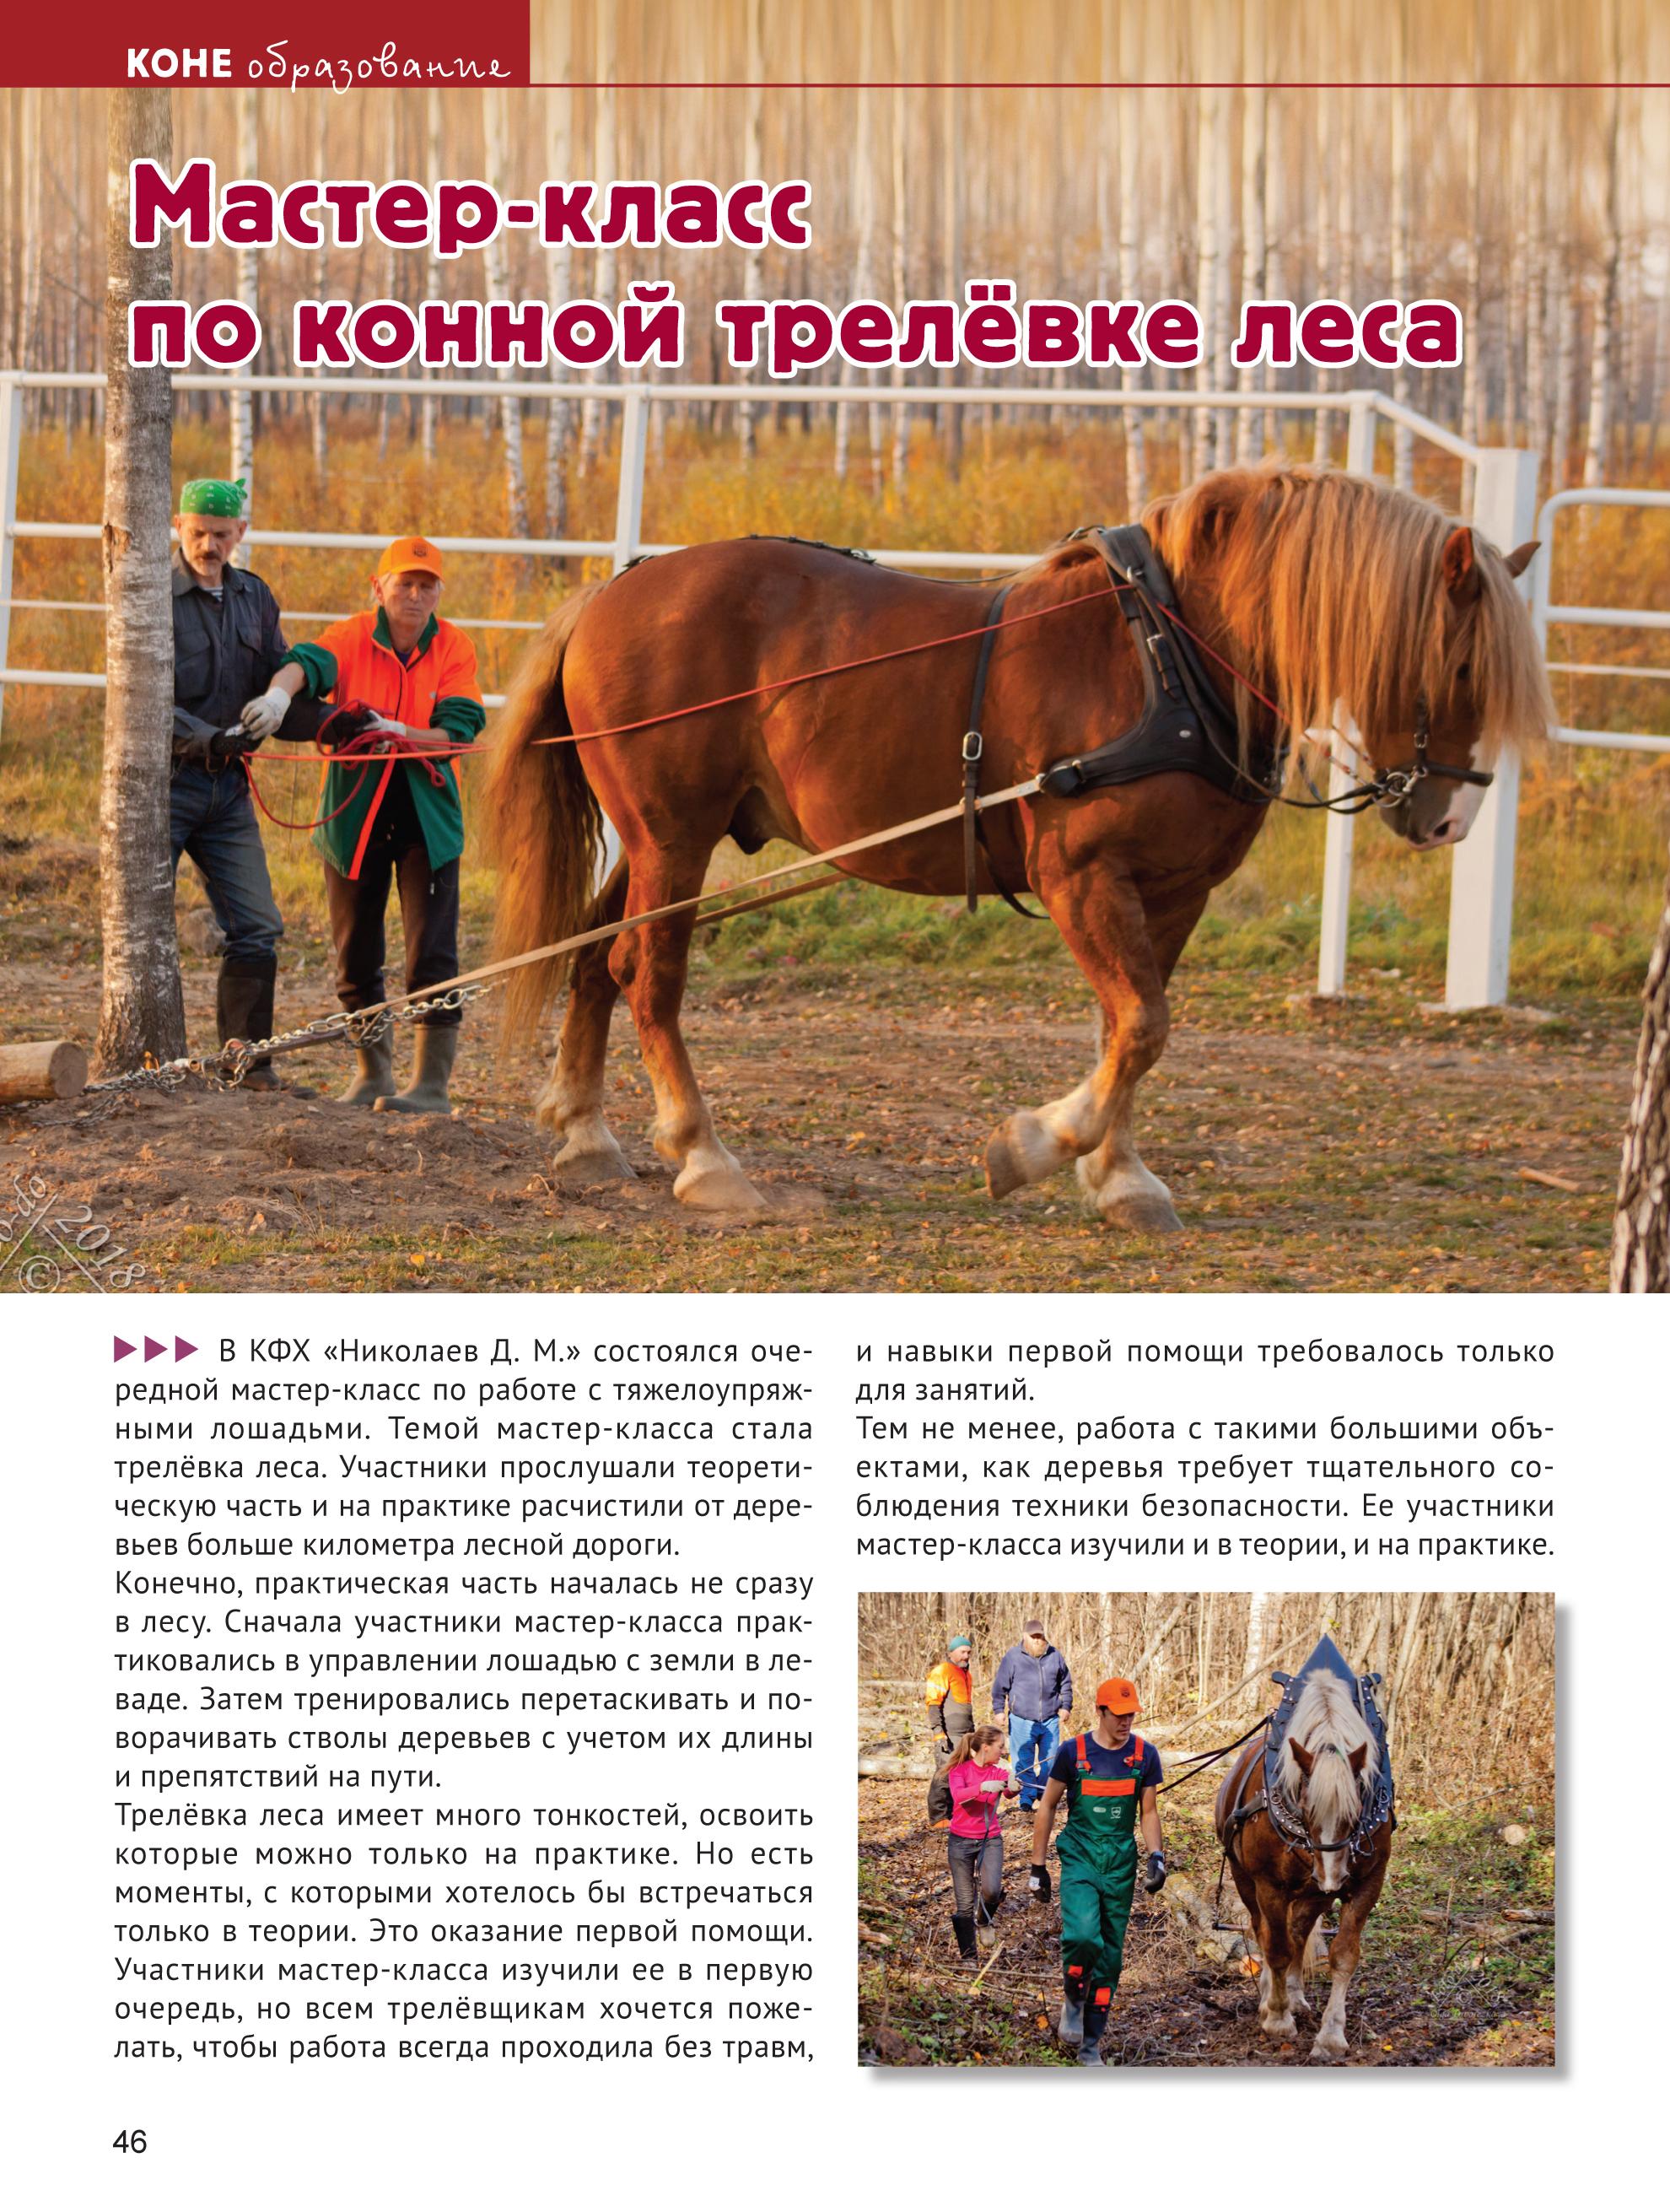 Book KONEVODITEL 62018 print-46